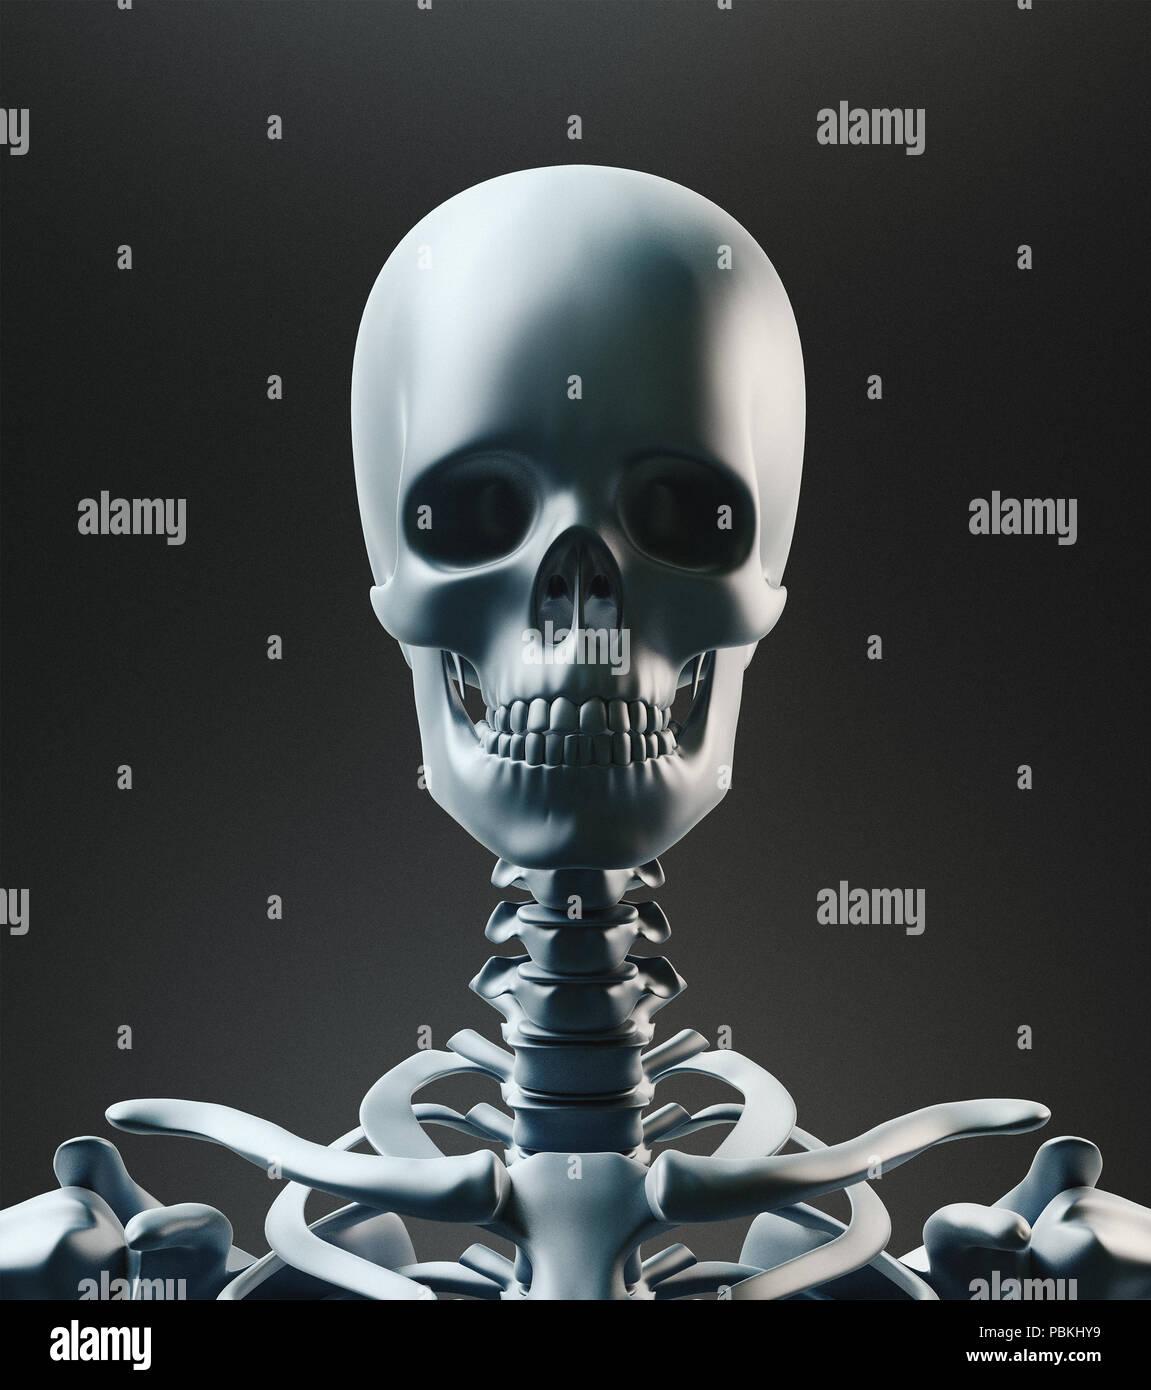 Human skeleton, body bones, 3d render illustration Stock